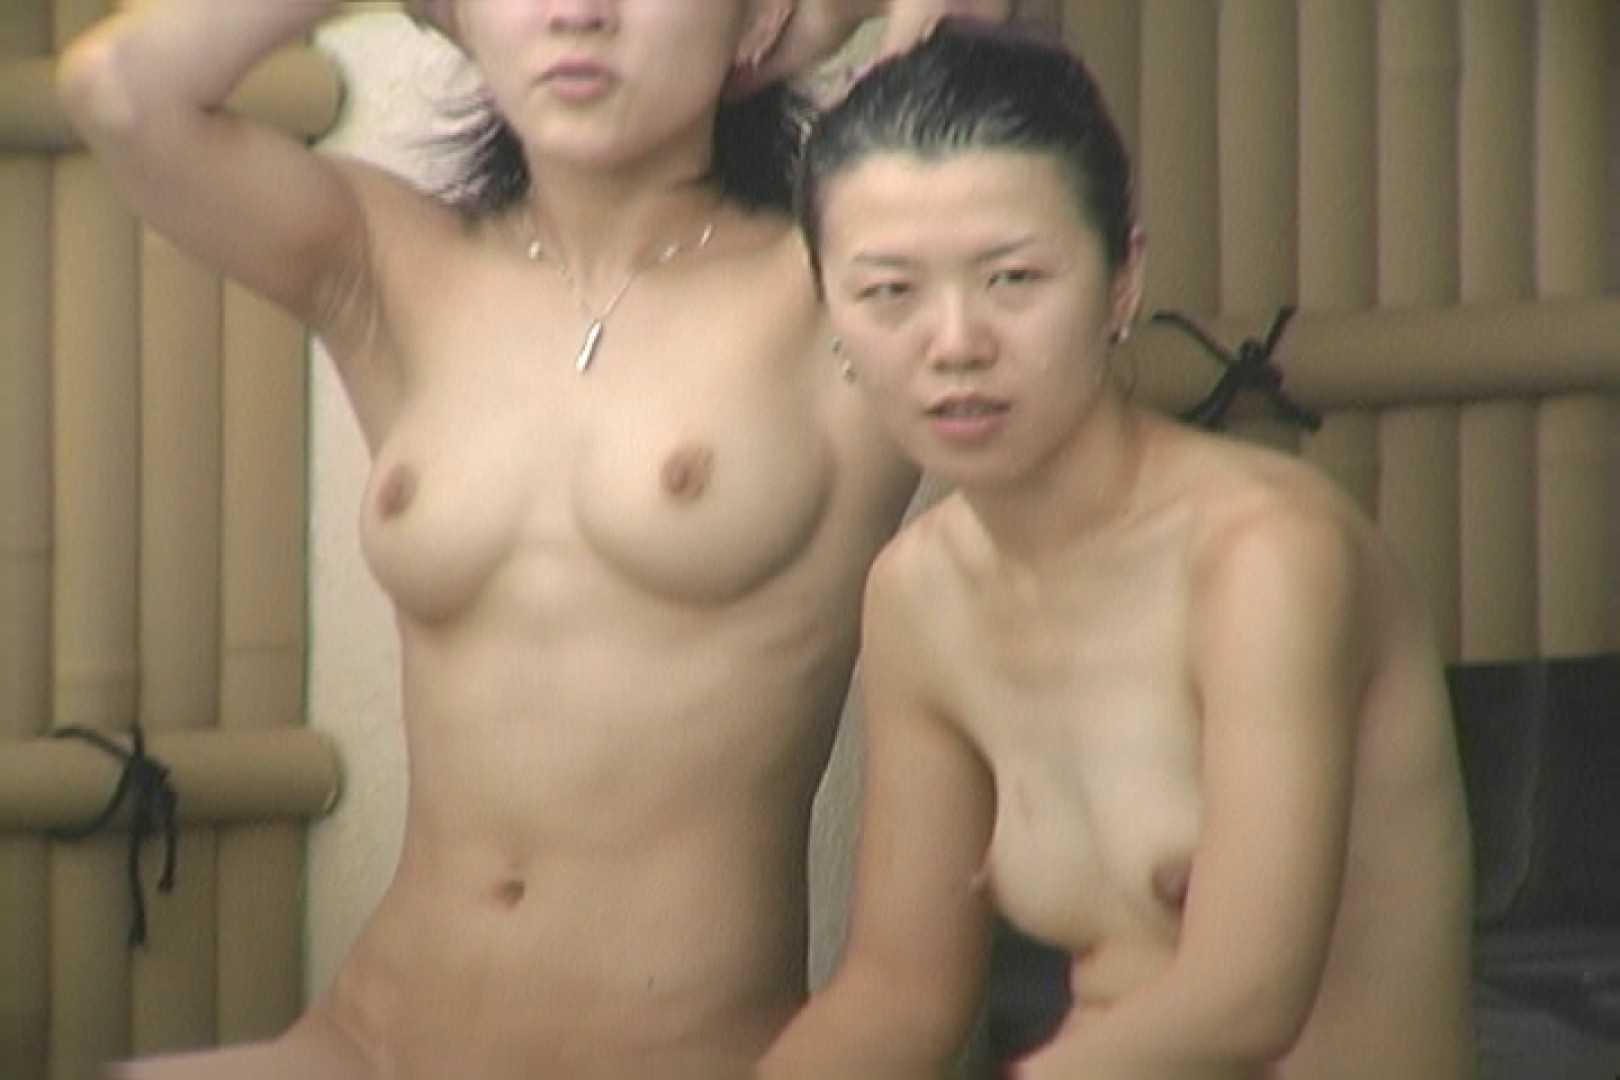 Aquaな露天風呂Vol.638 OLのエロ生活 オメコ無修正動画無料 19連発 8